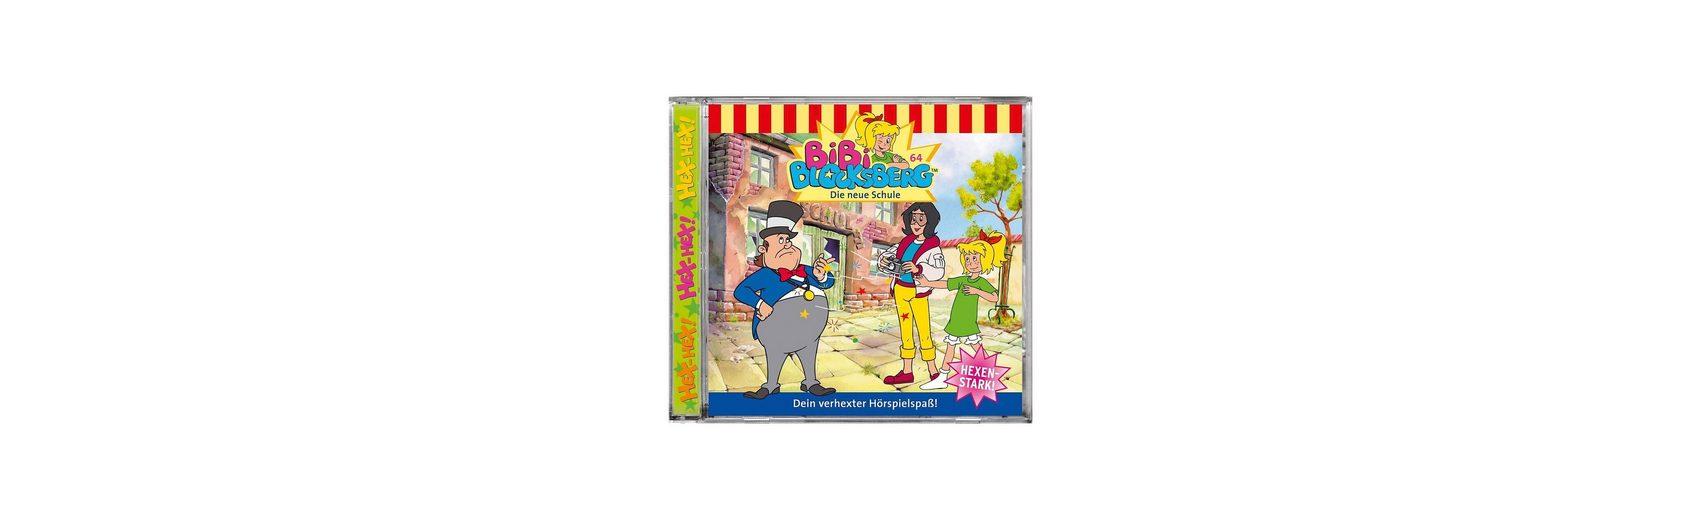 Kiddinx CD Bibi Blocksberg Die neue Schule